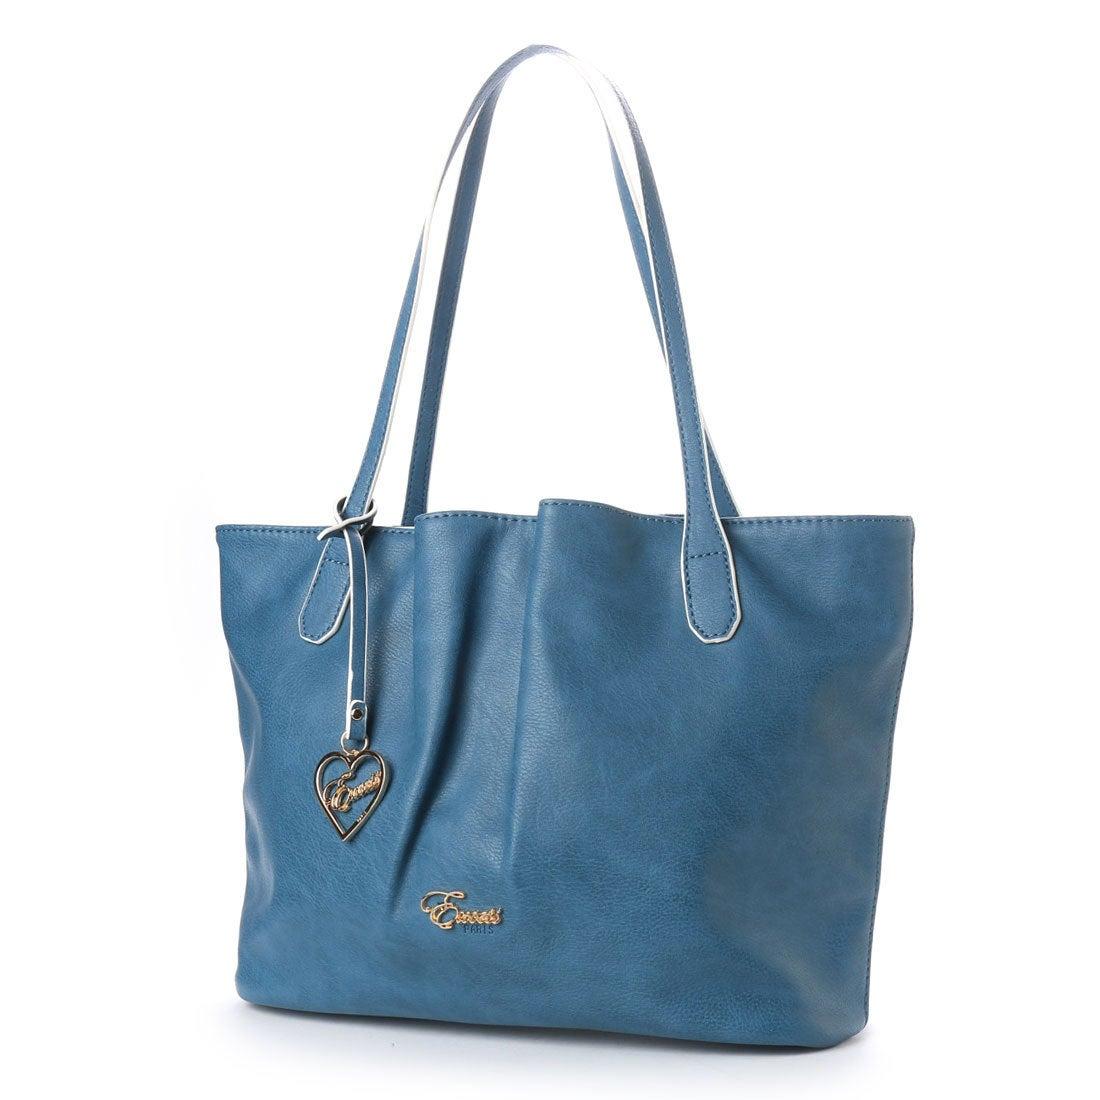 【SALE 41%OFF】フィラノ FIRANO オリジナルチャーム付ミニハンドバッグ (BLUE) レディース